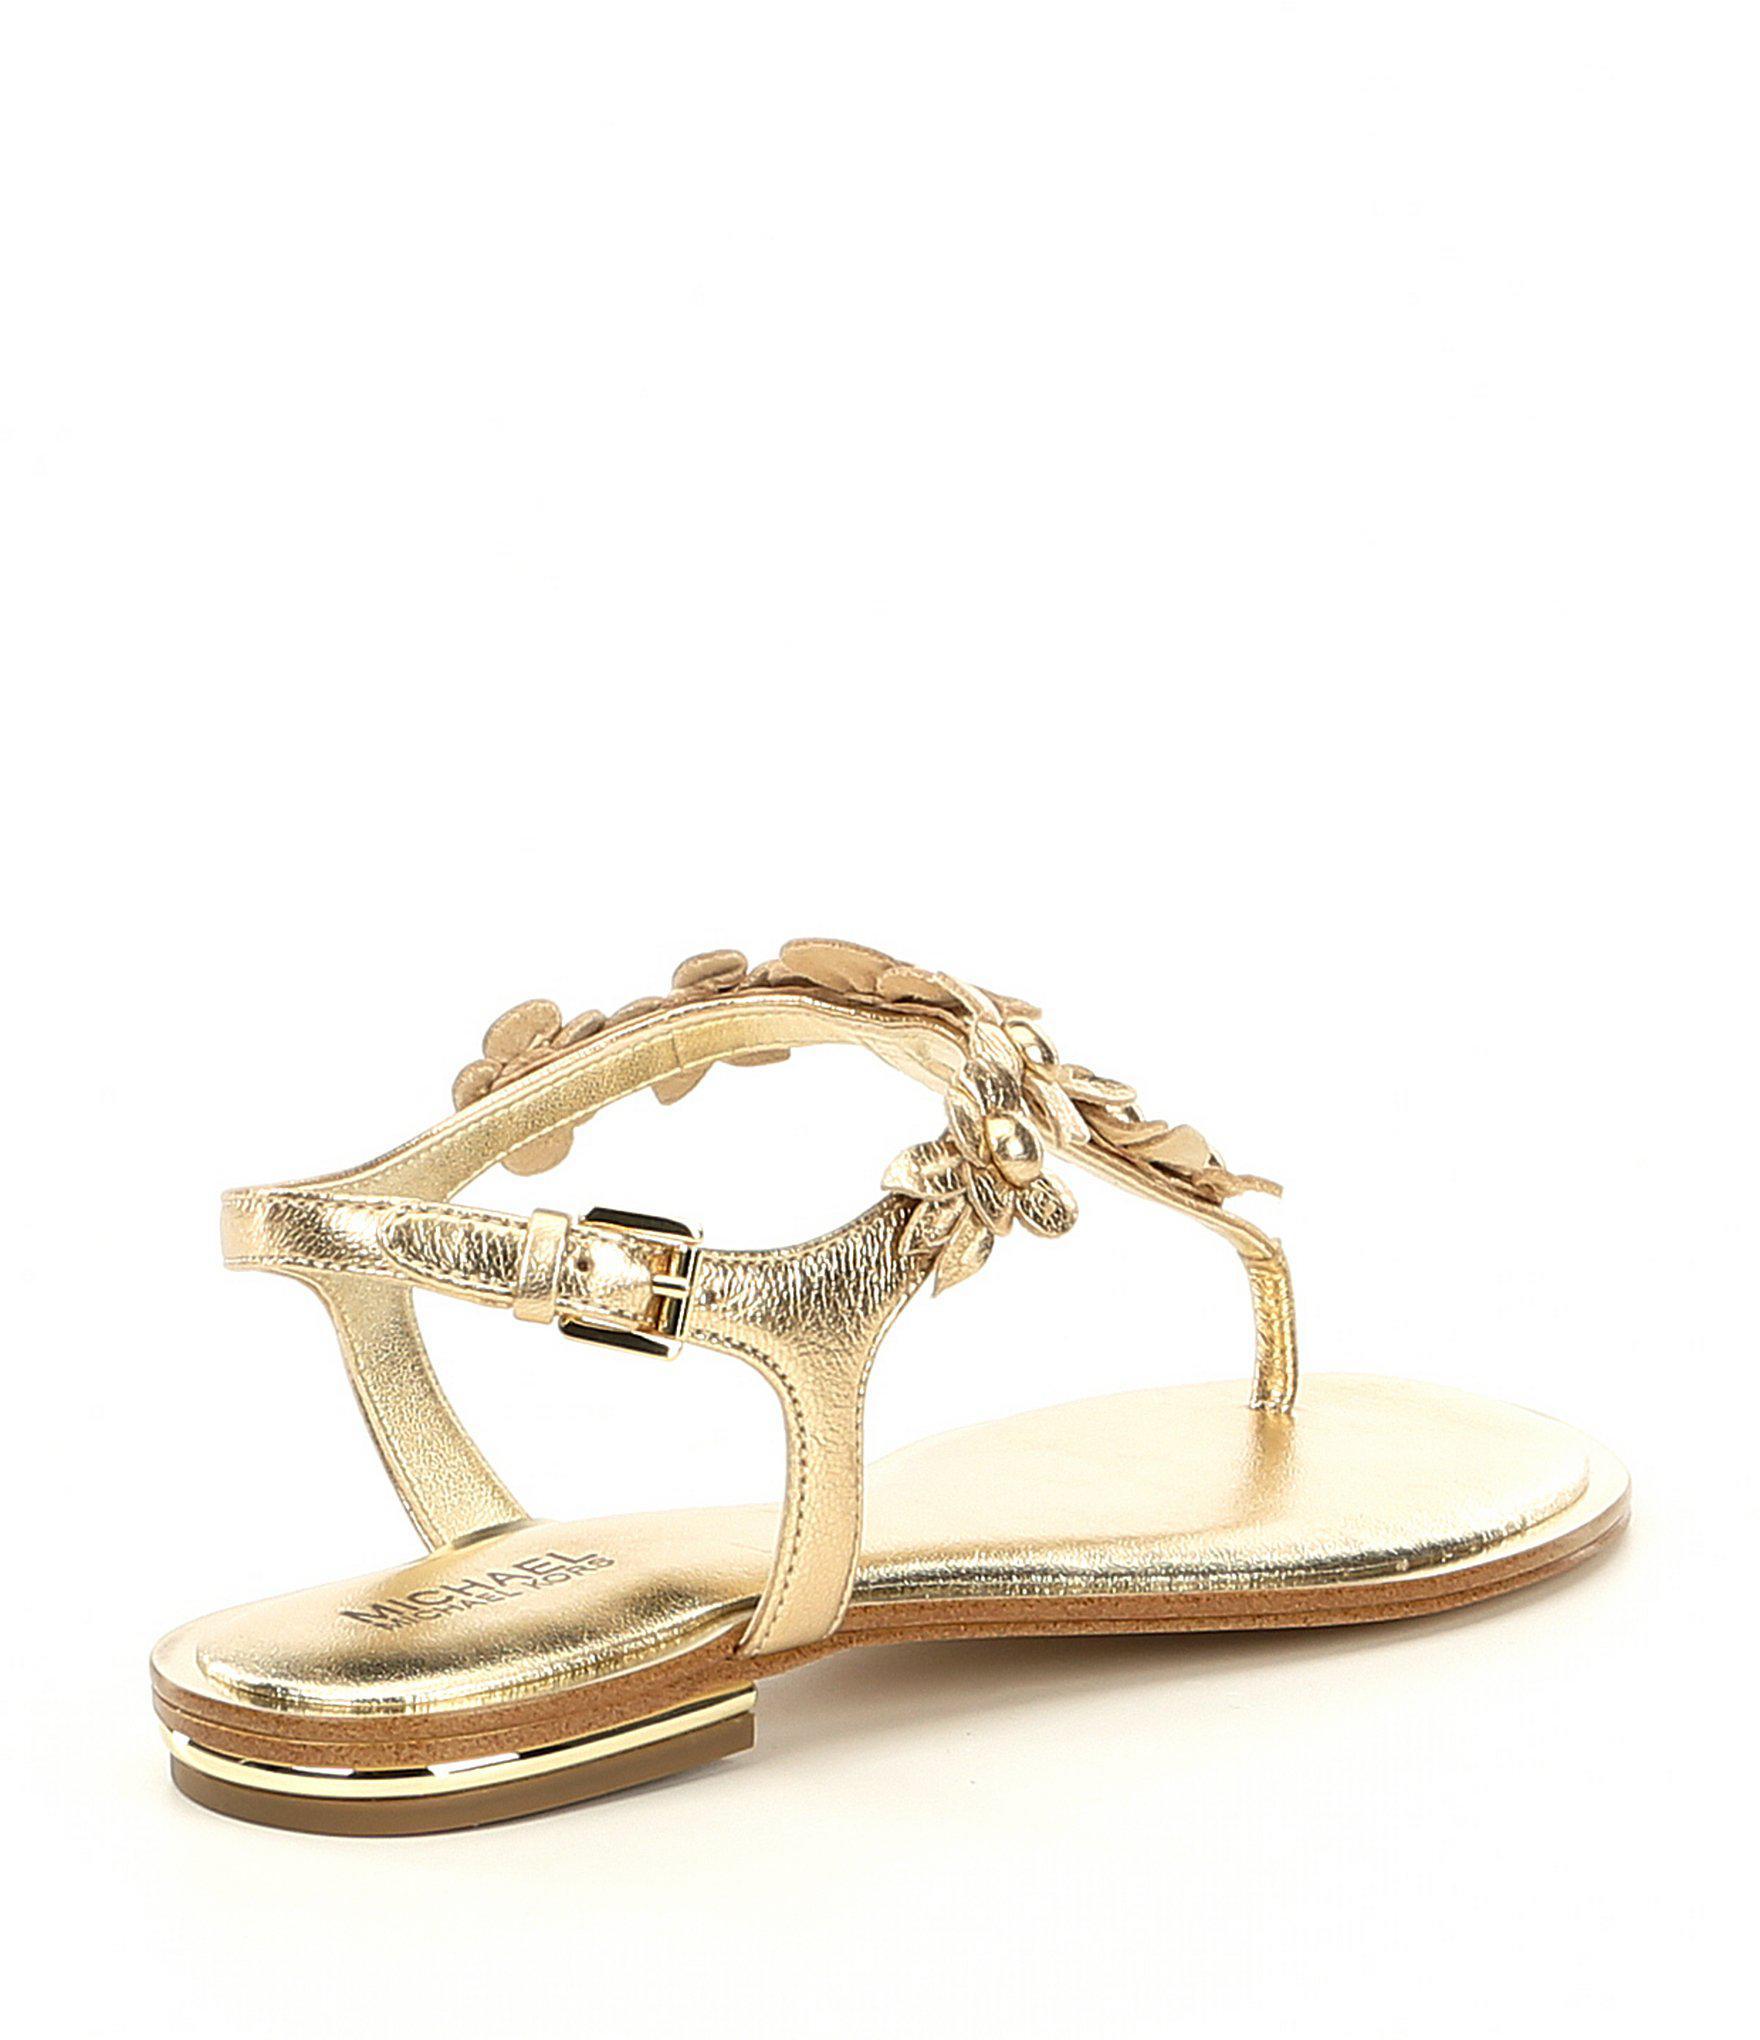 a2a6e0da7 Lyst - MICHAEL Michael Kors Tricia Metallic Floral Thong Sandals in ...